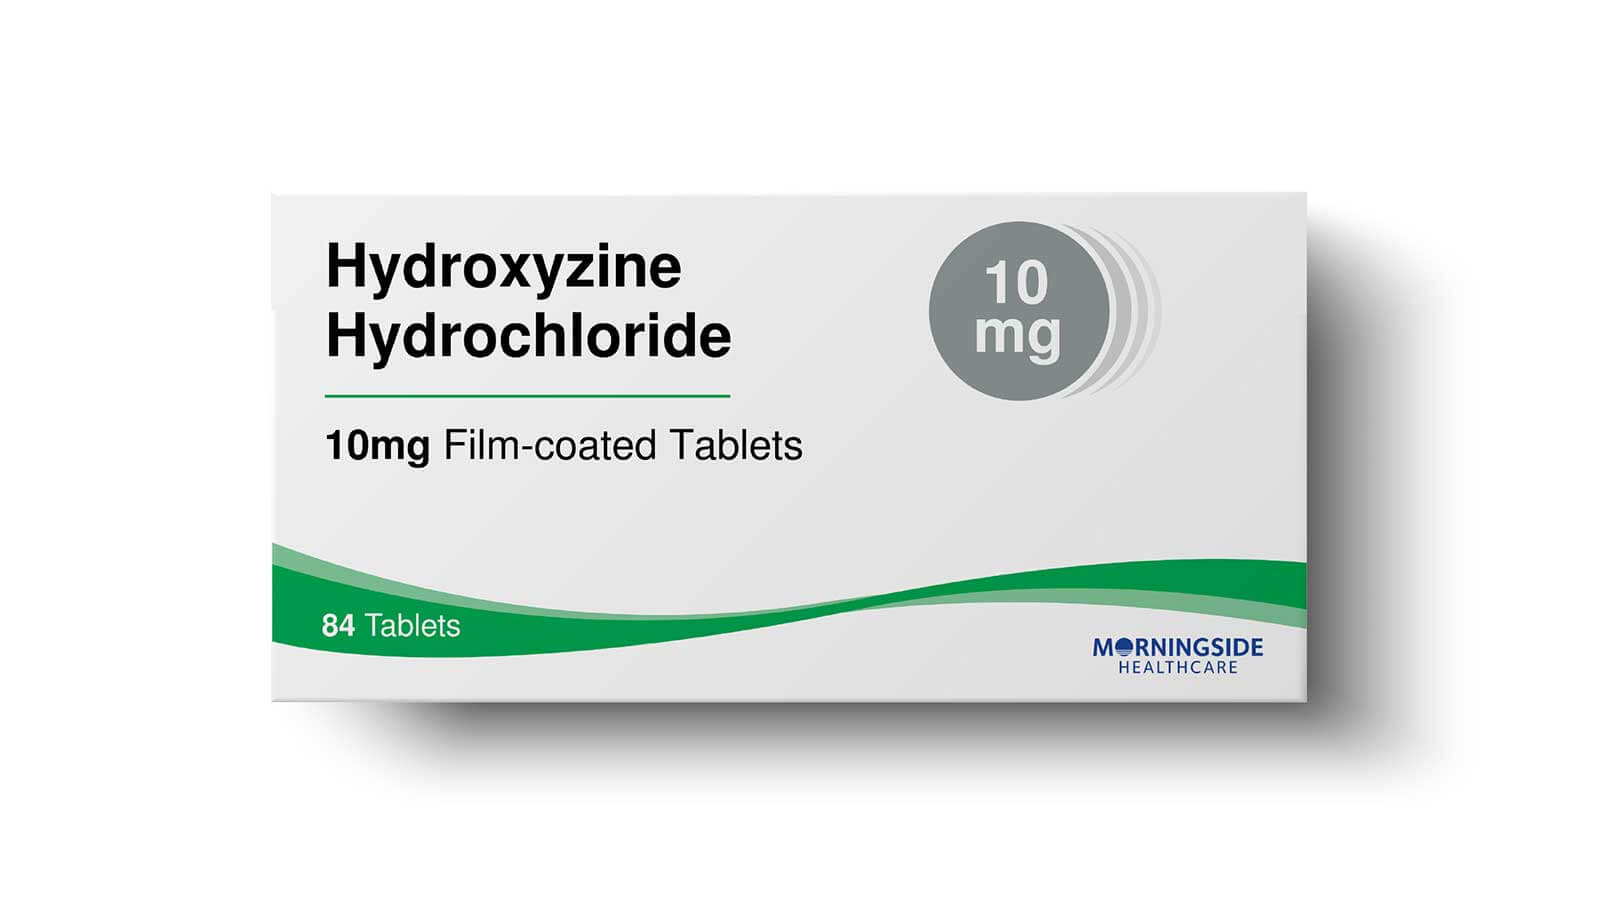 Hydralazine Hydrochloride Tablets